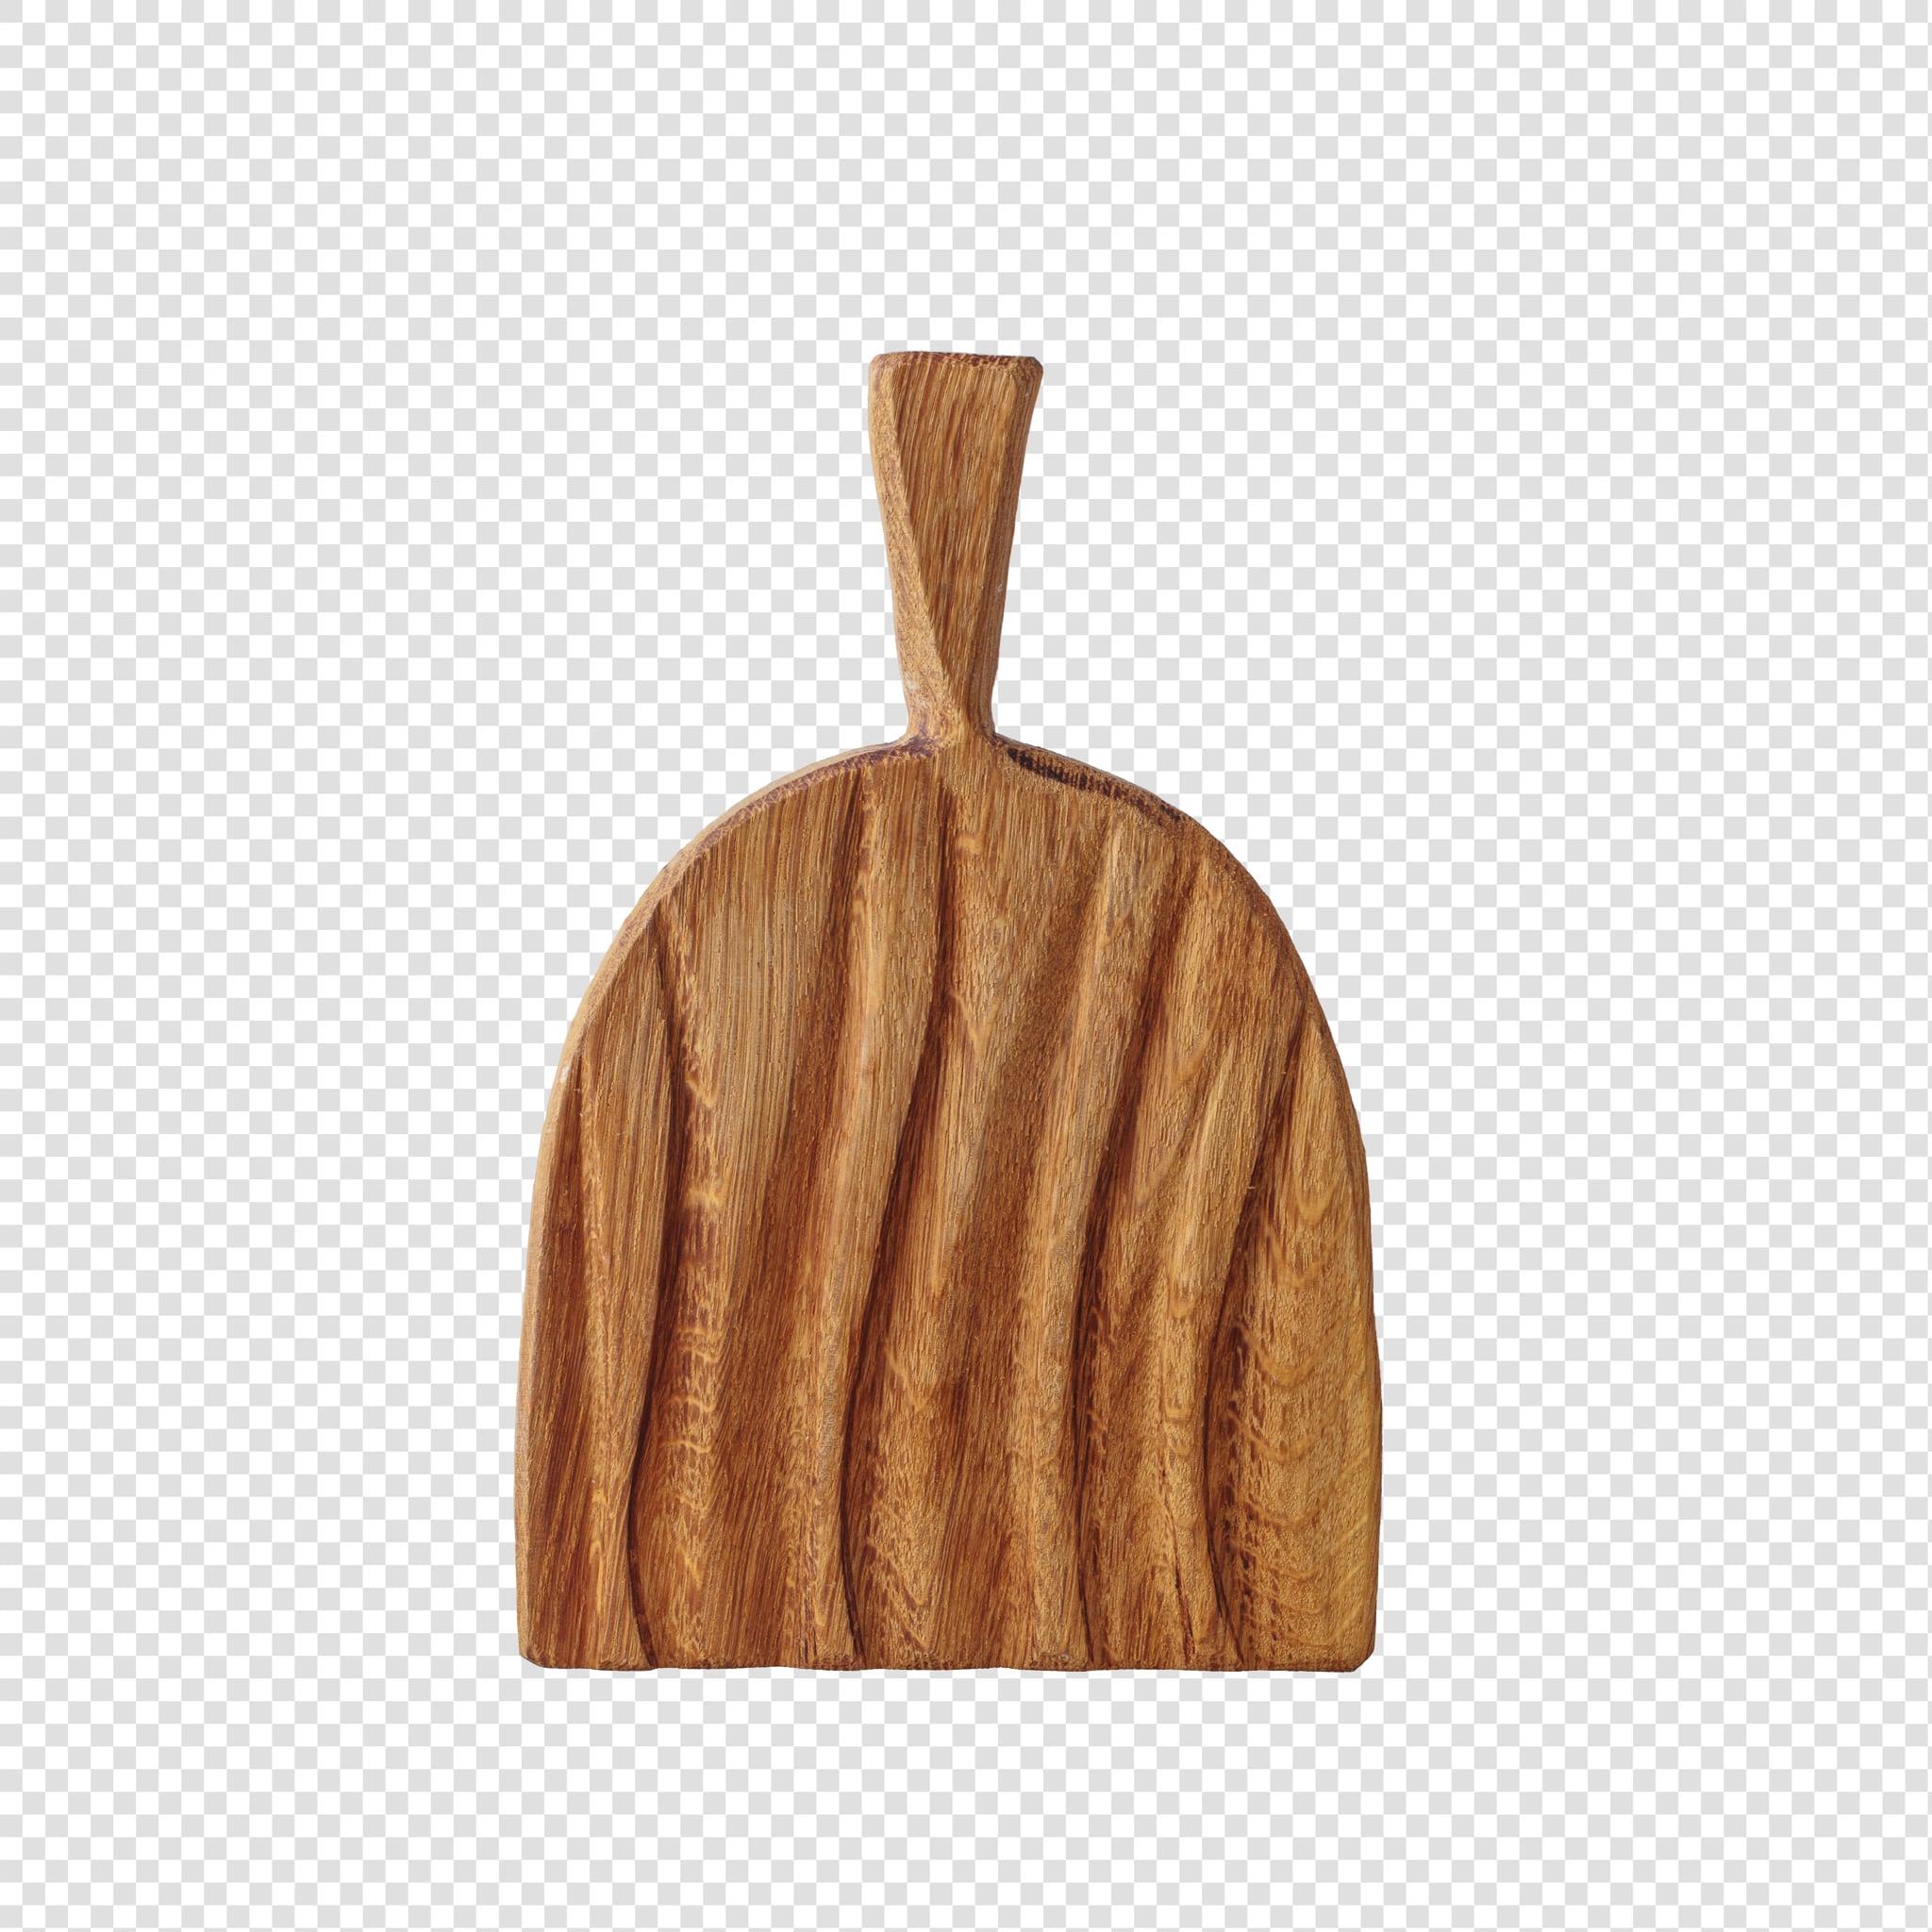 Craft PSD layered image